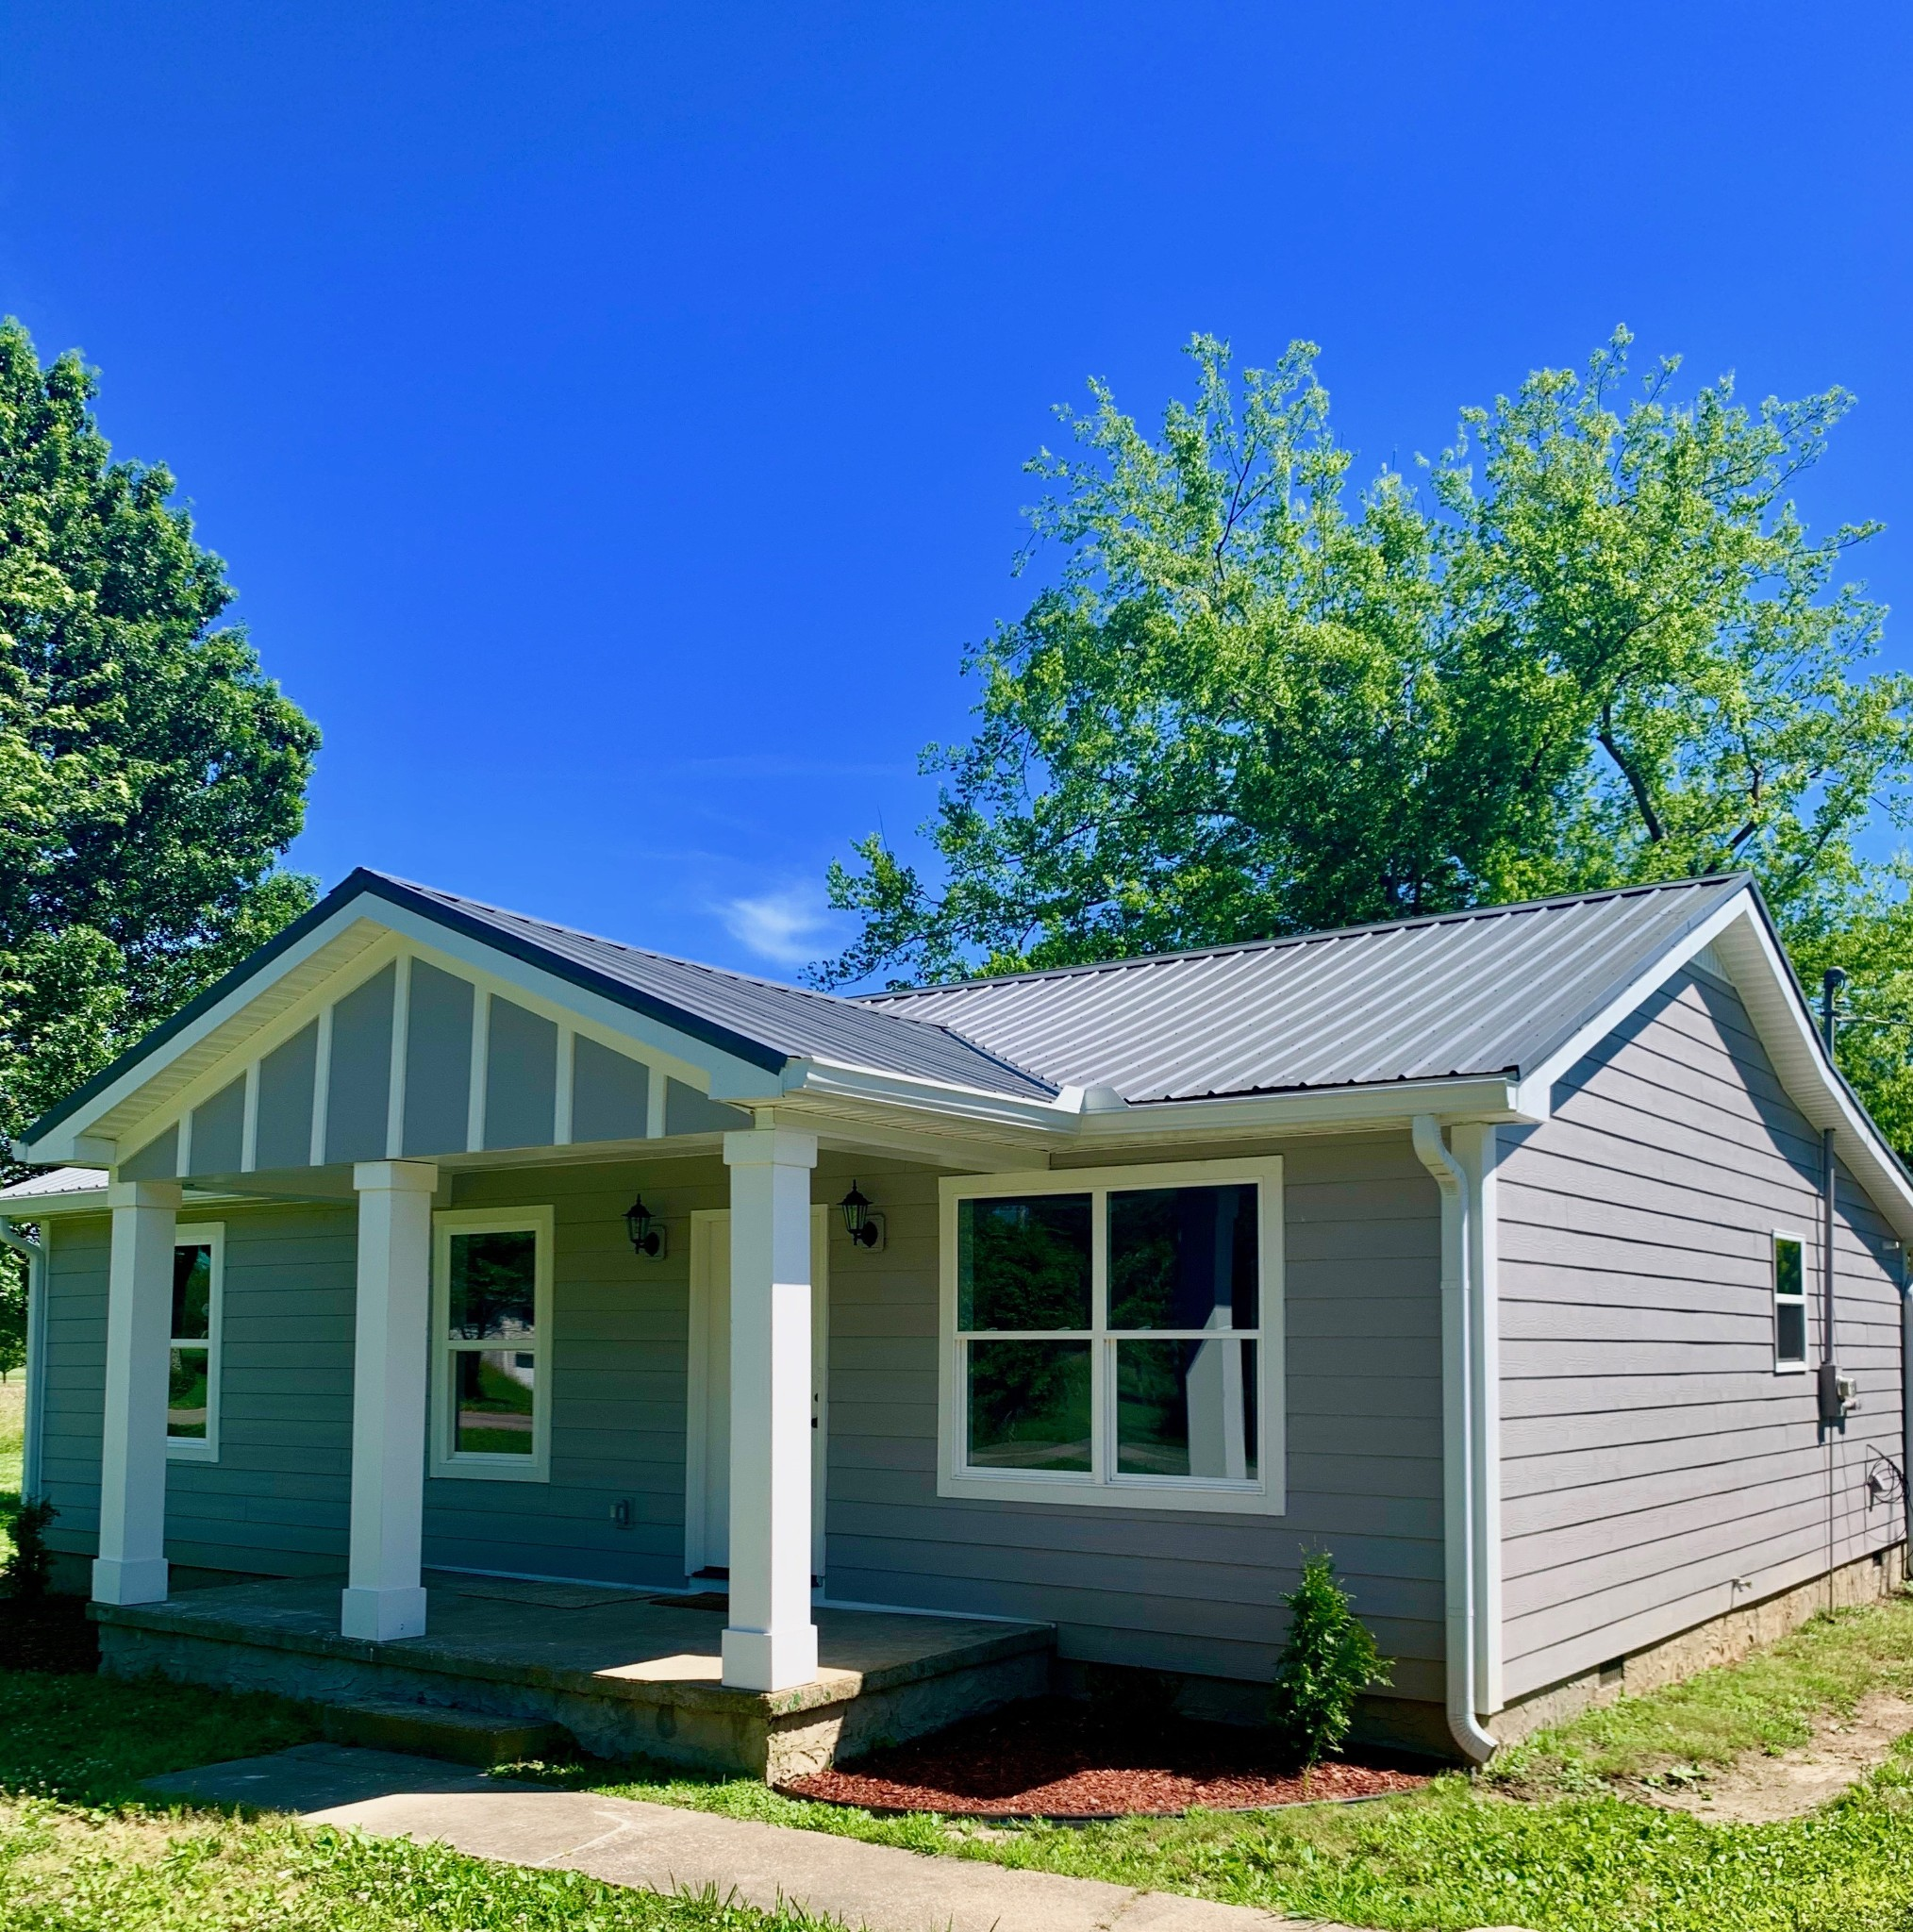 775 Saint Patrick St Property Photo - MC EWEN, TN real estate listing